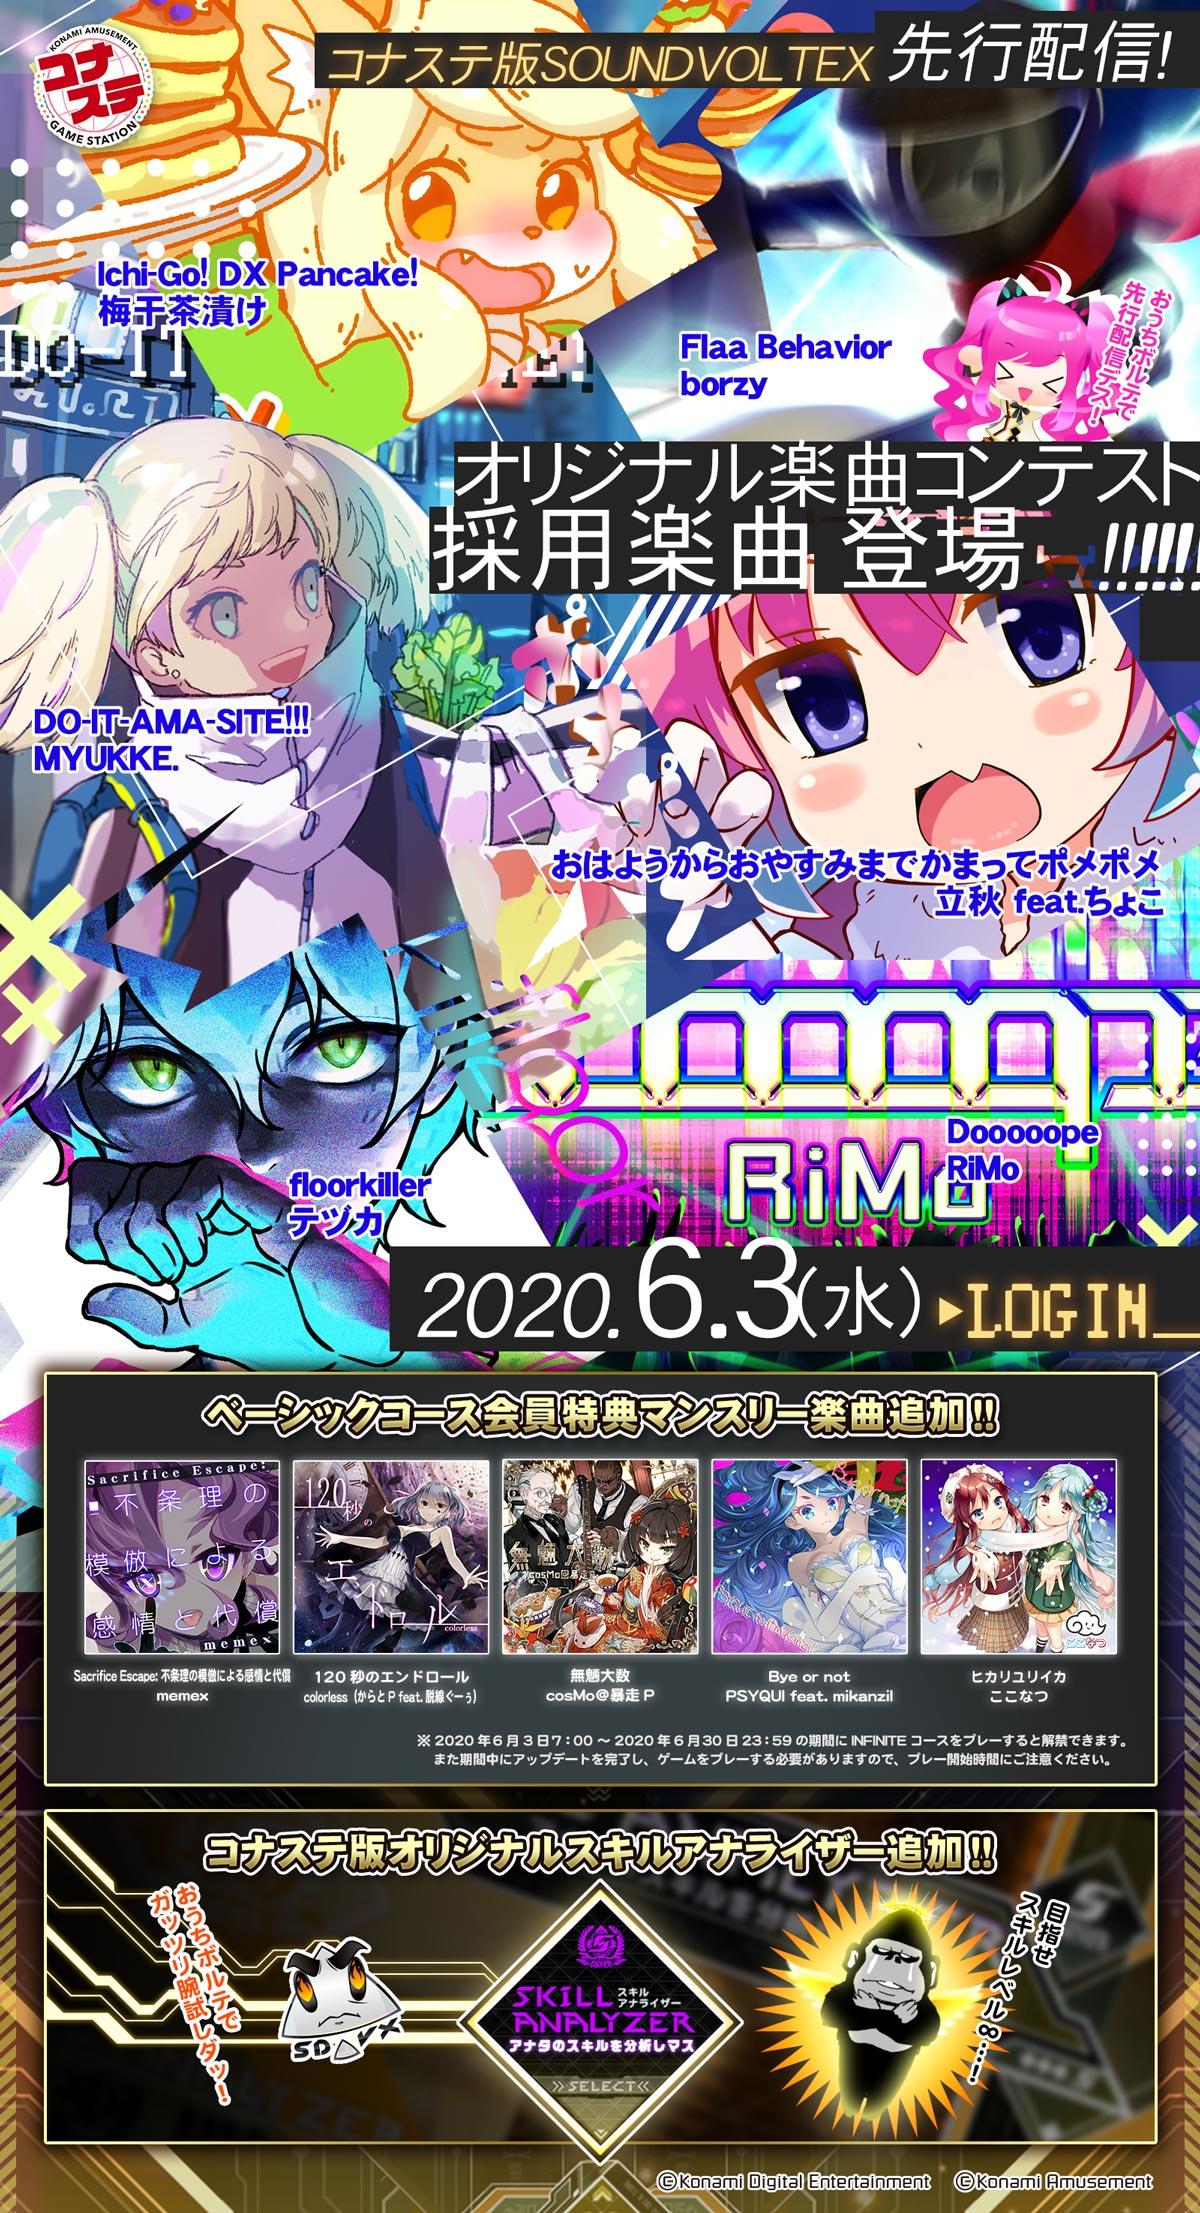 https://eacache.s.konaminet.jp/game/sdvx/v/p/images/p/top/top_image/200603_konasute_update.jpg